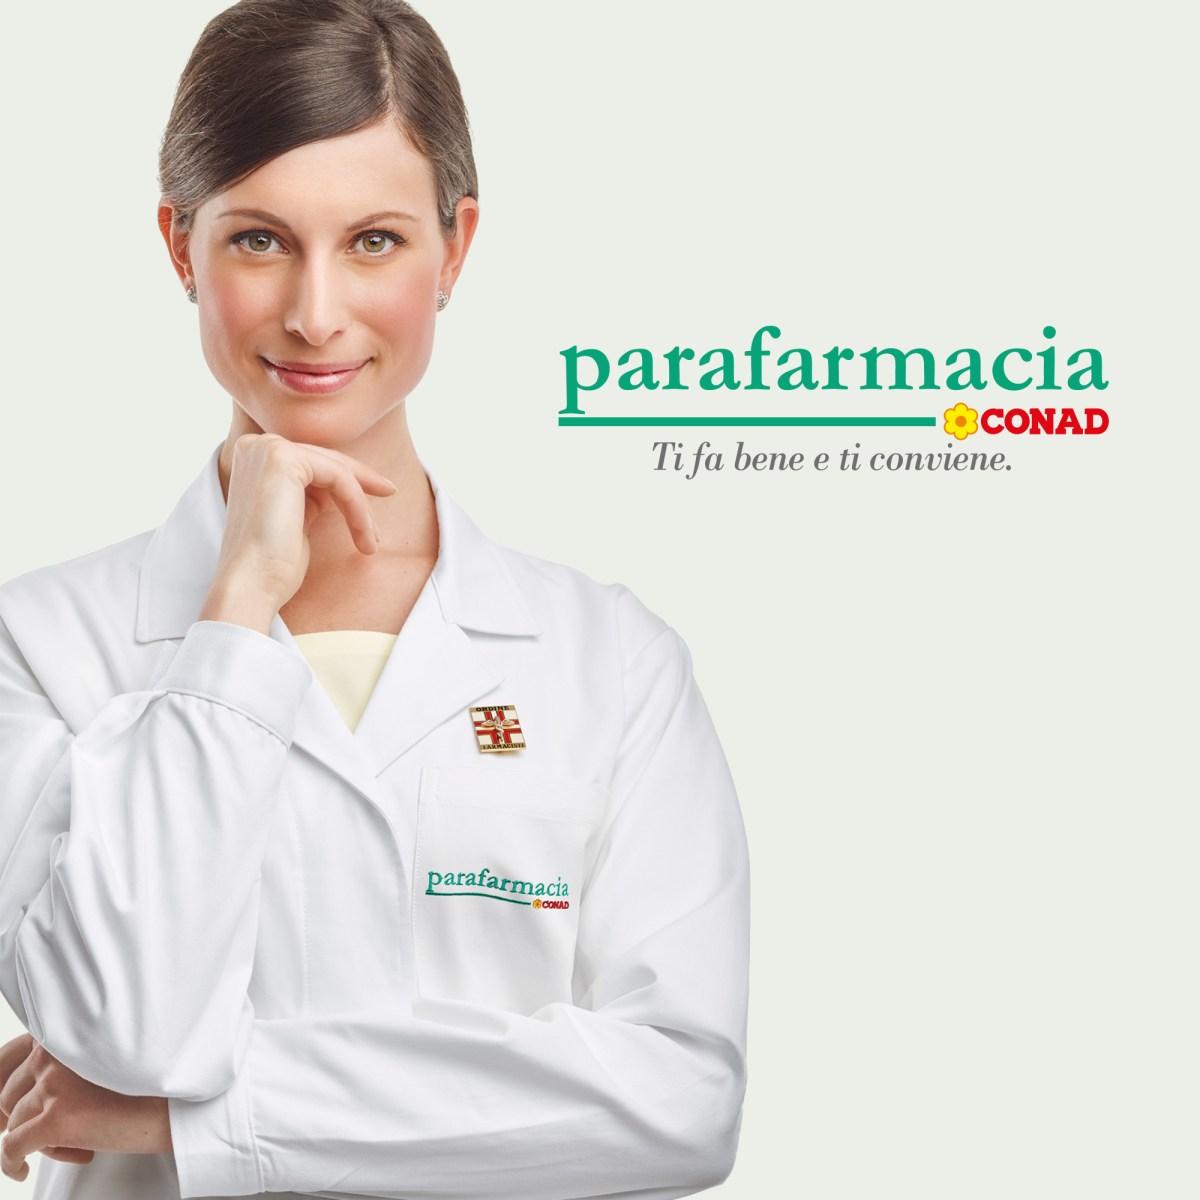 parafarmacia home Sintesi/HUB agenzia marketing Trieste